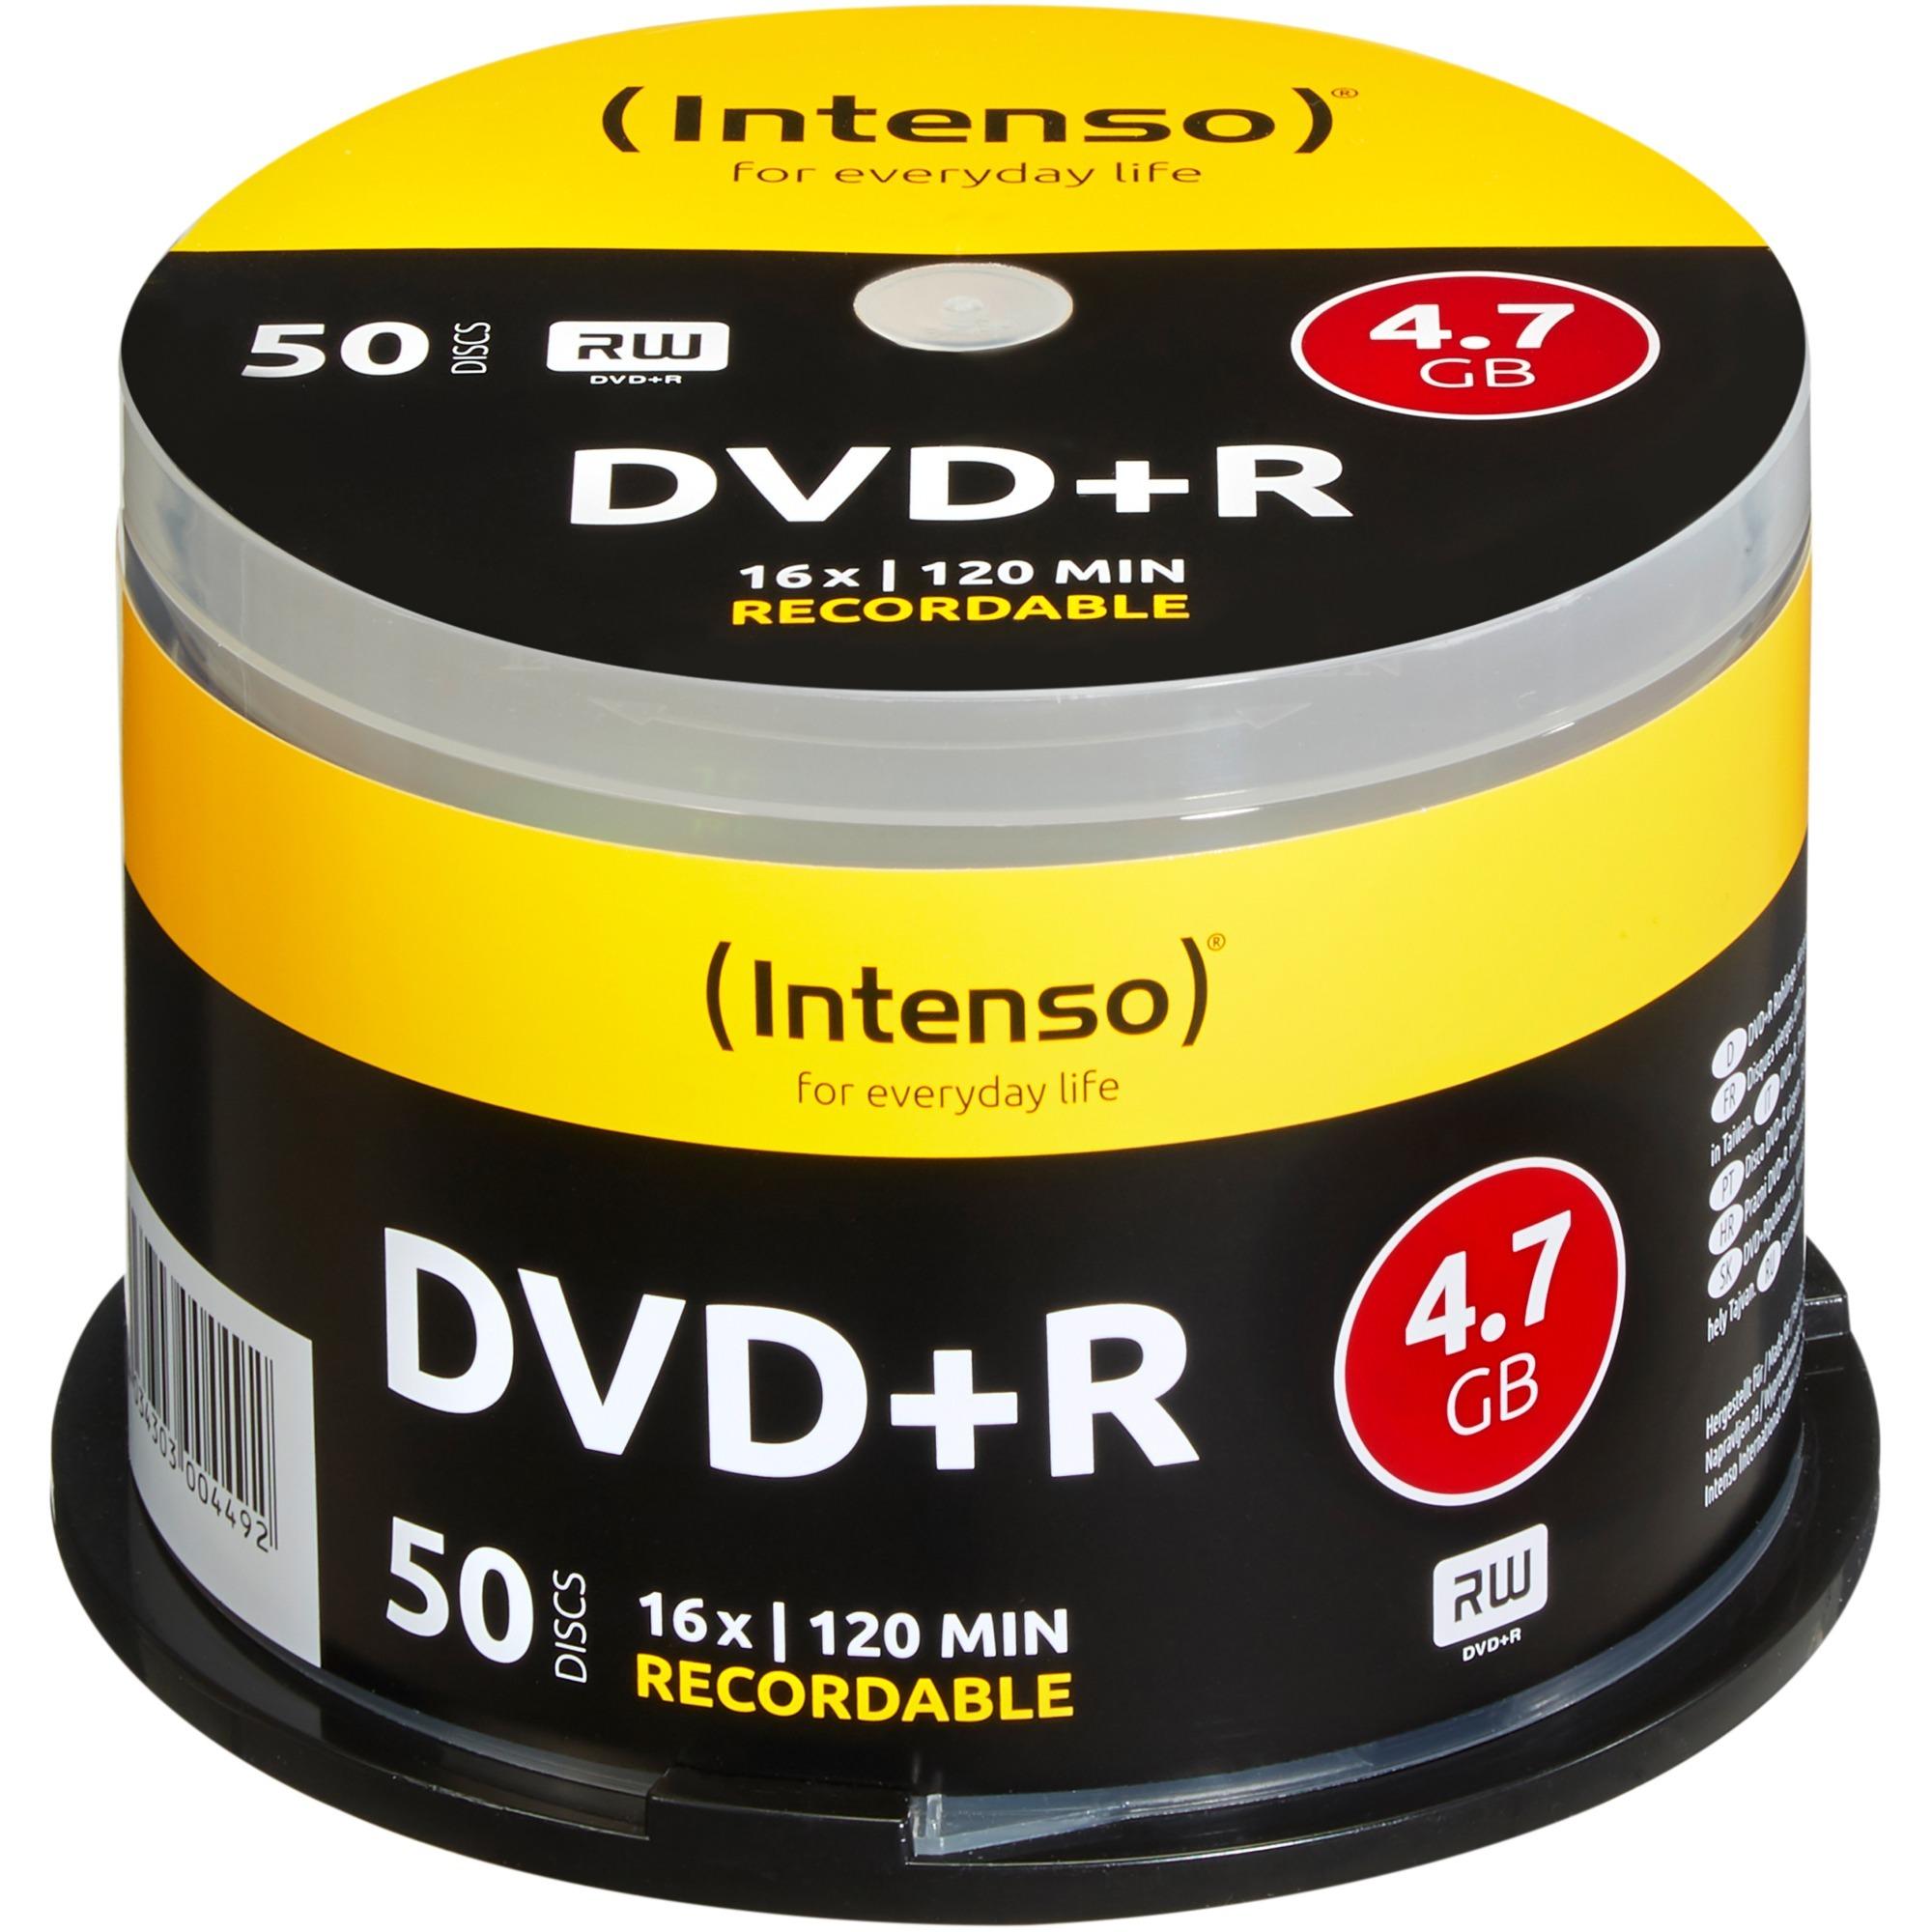 DVD+R 4.7GB, 16x 4.7Go DVD+R 50pièce(s), Support vierge DVD